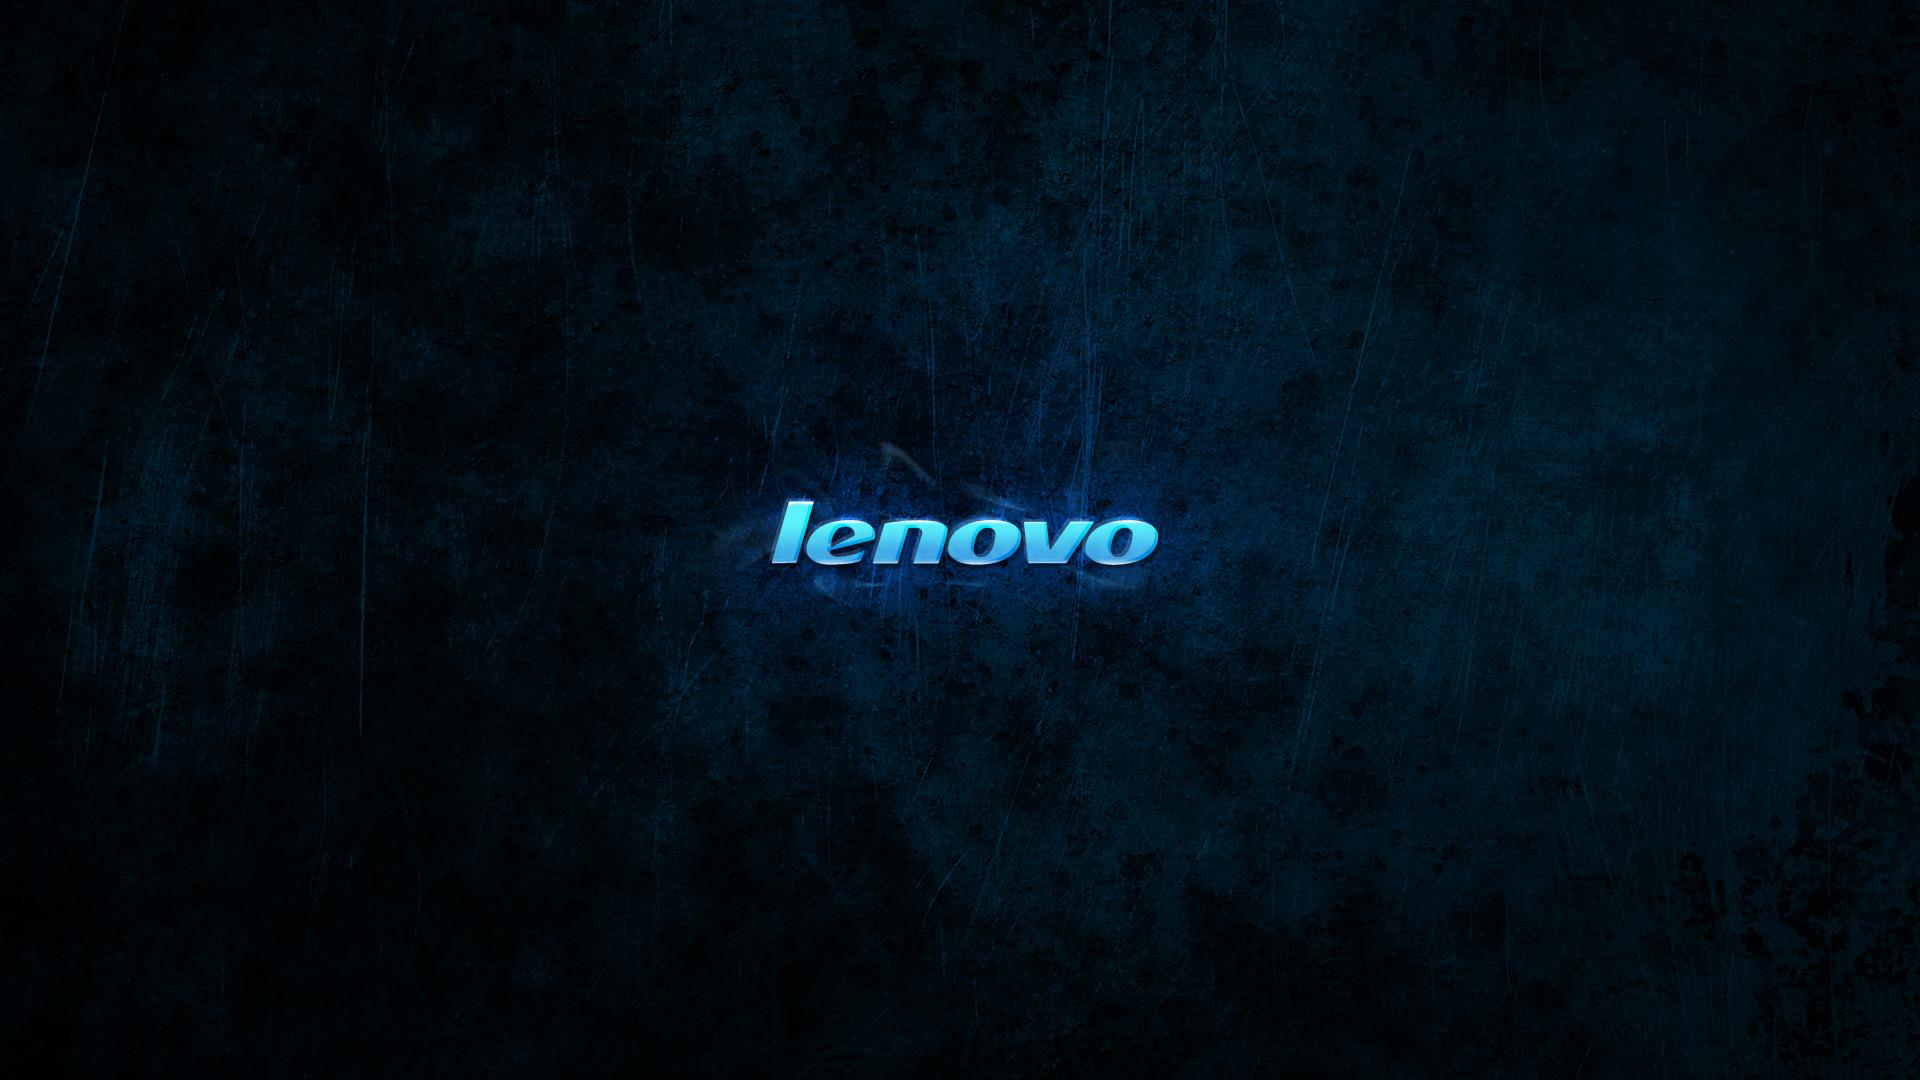 Lenovo Windows 10 Wallpaper (69+ Images